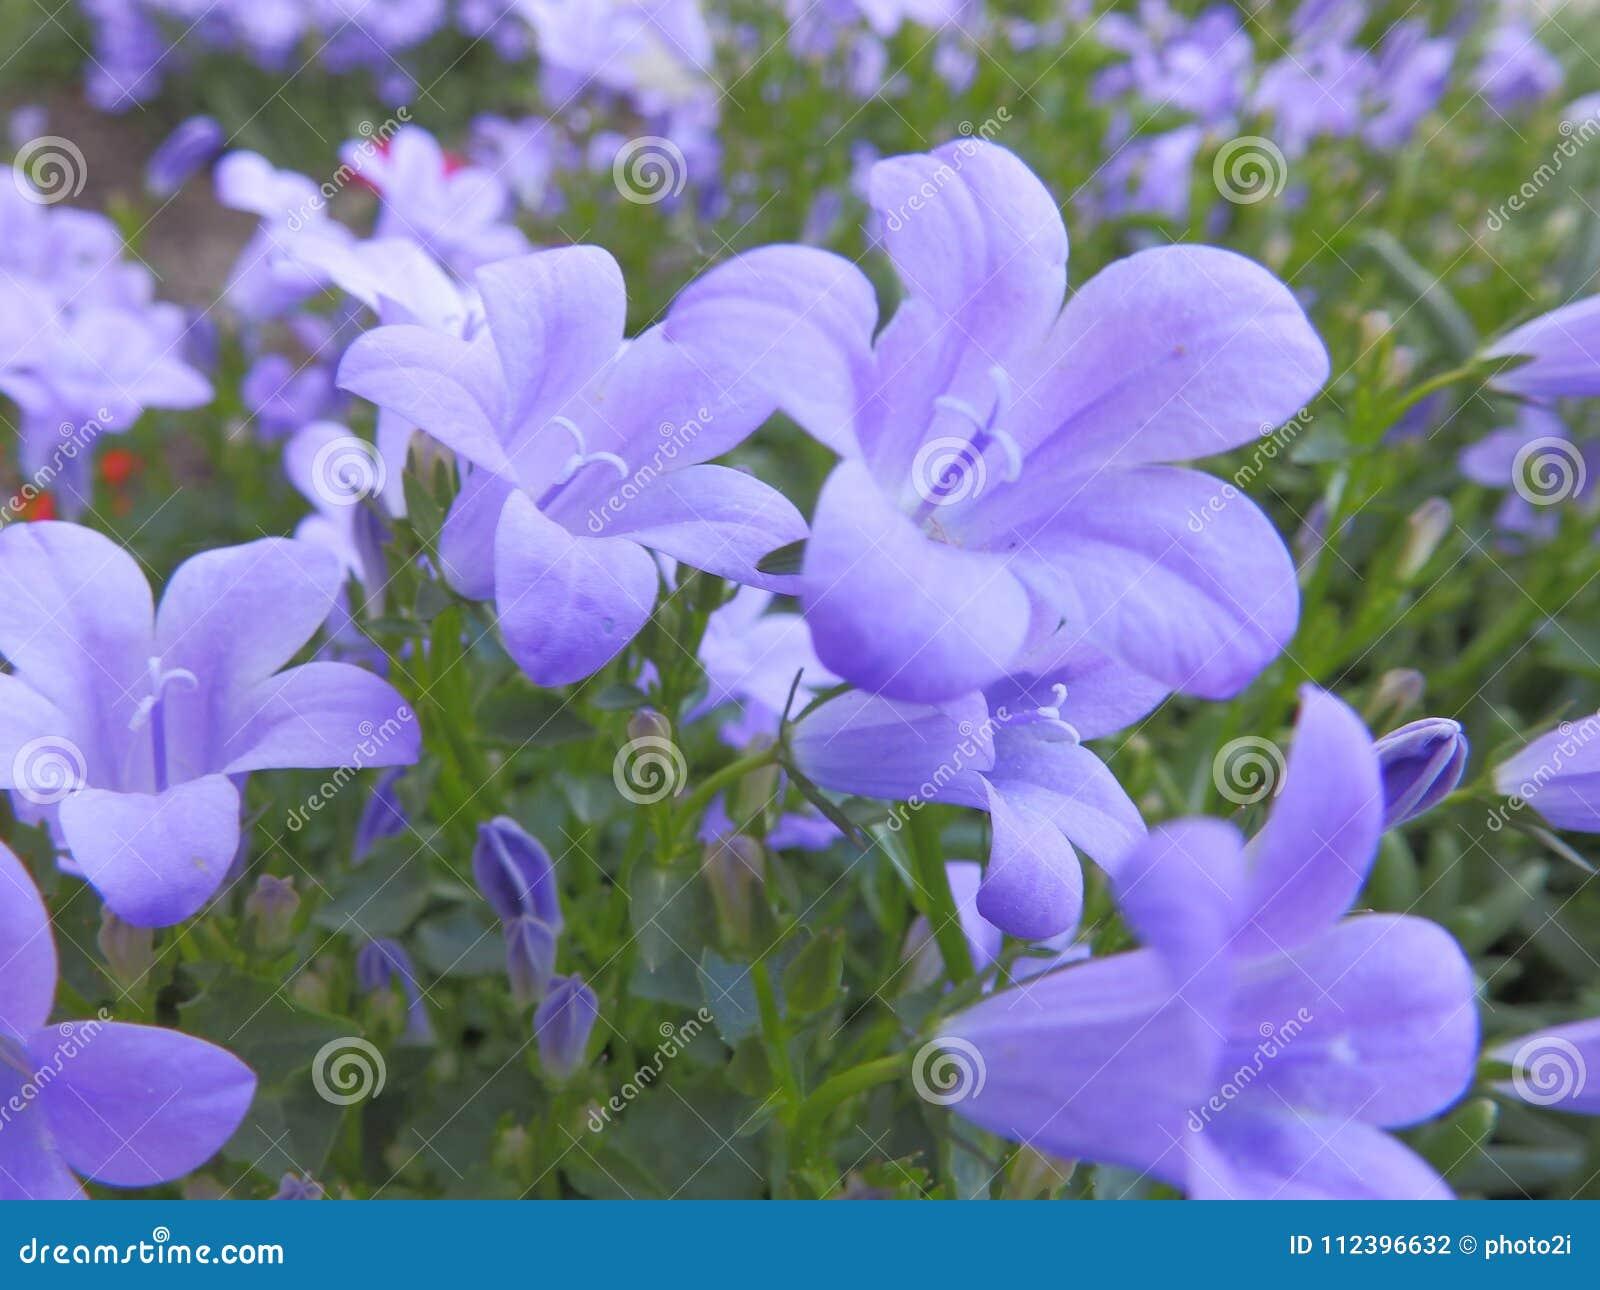 Gentle Purple Bellflowers Closeup Stock Photo Image Of Leavs